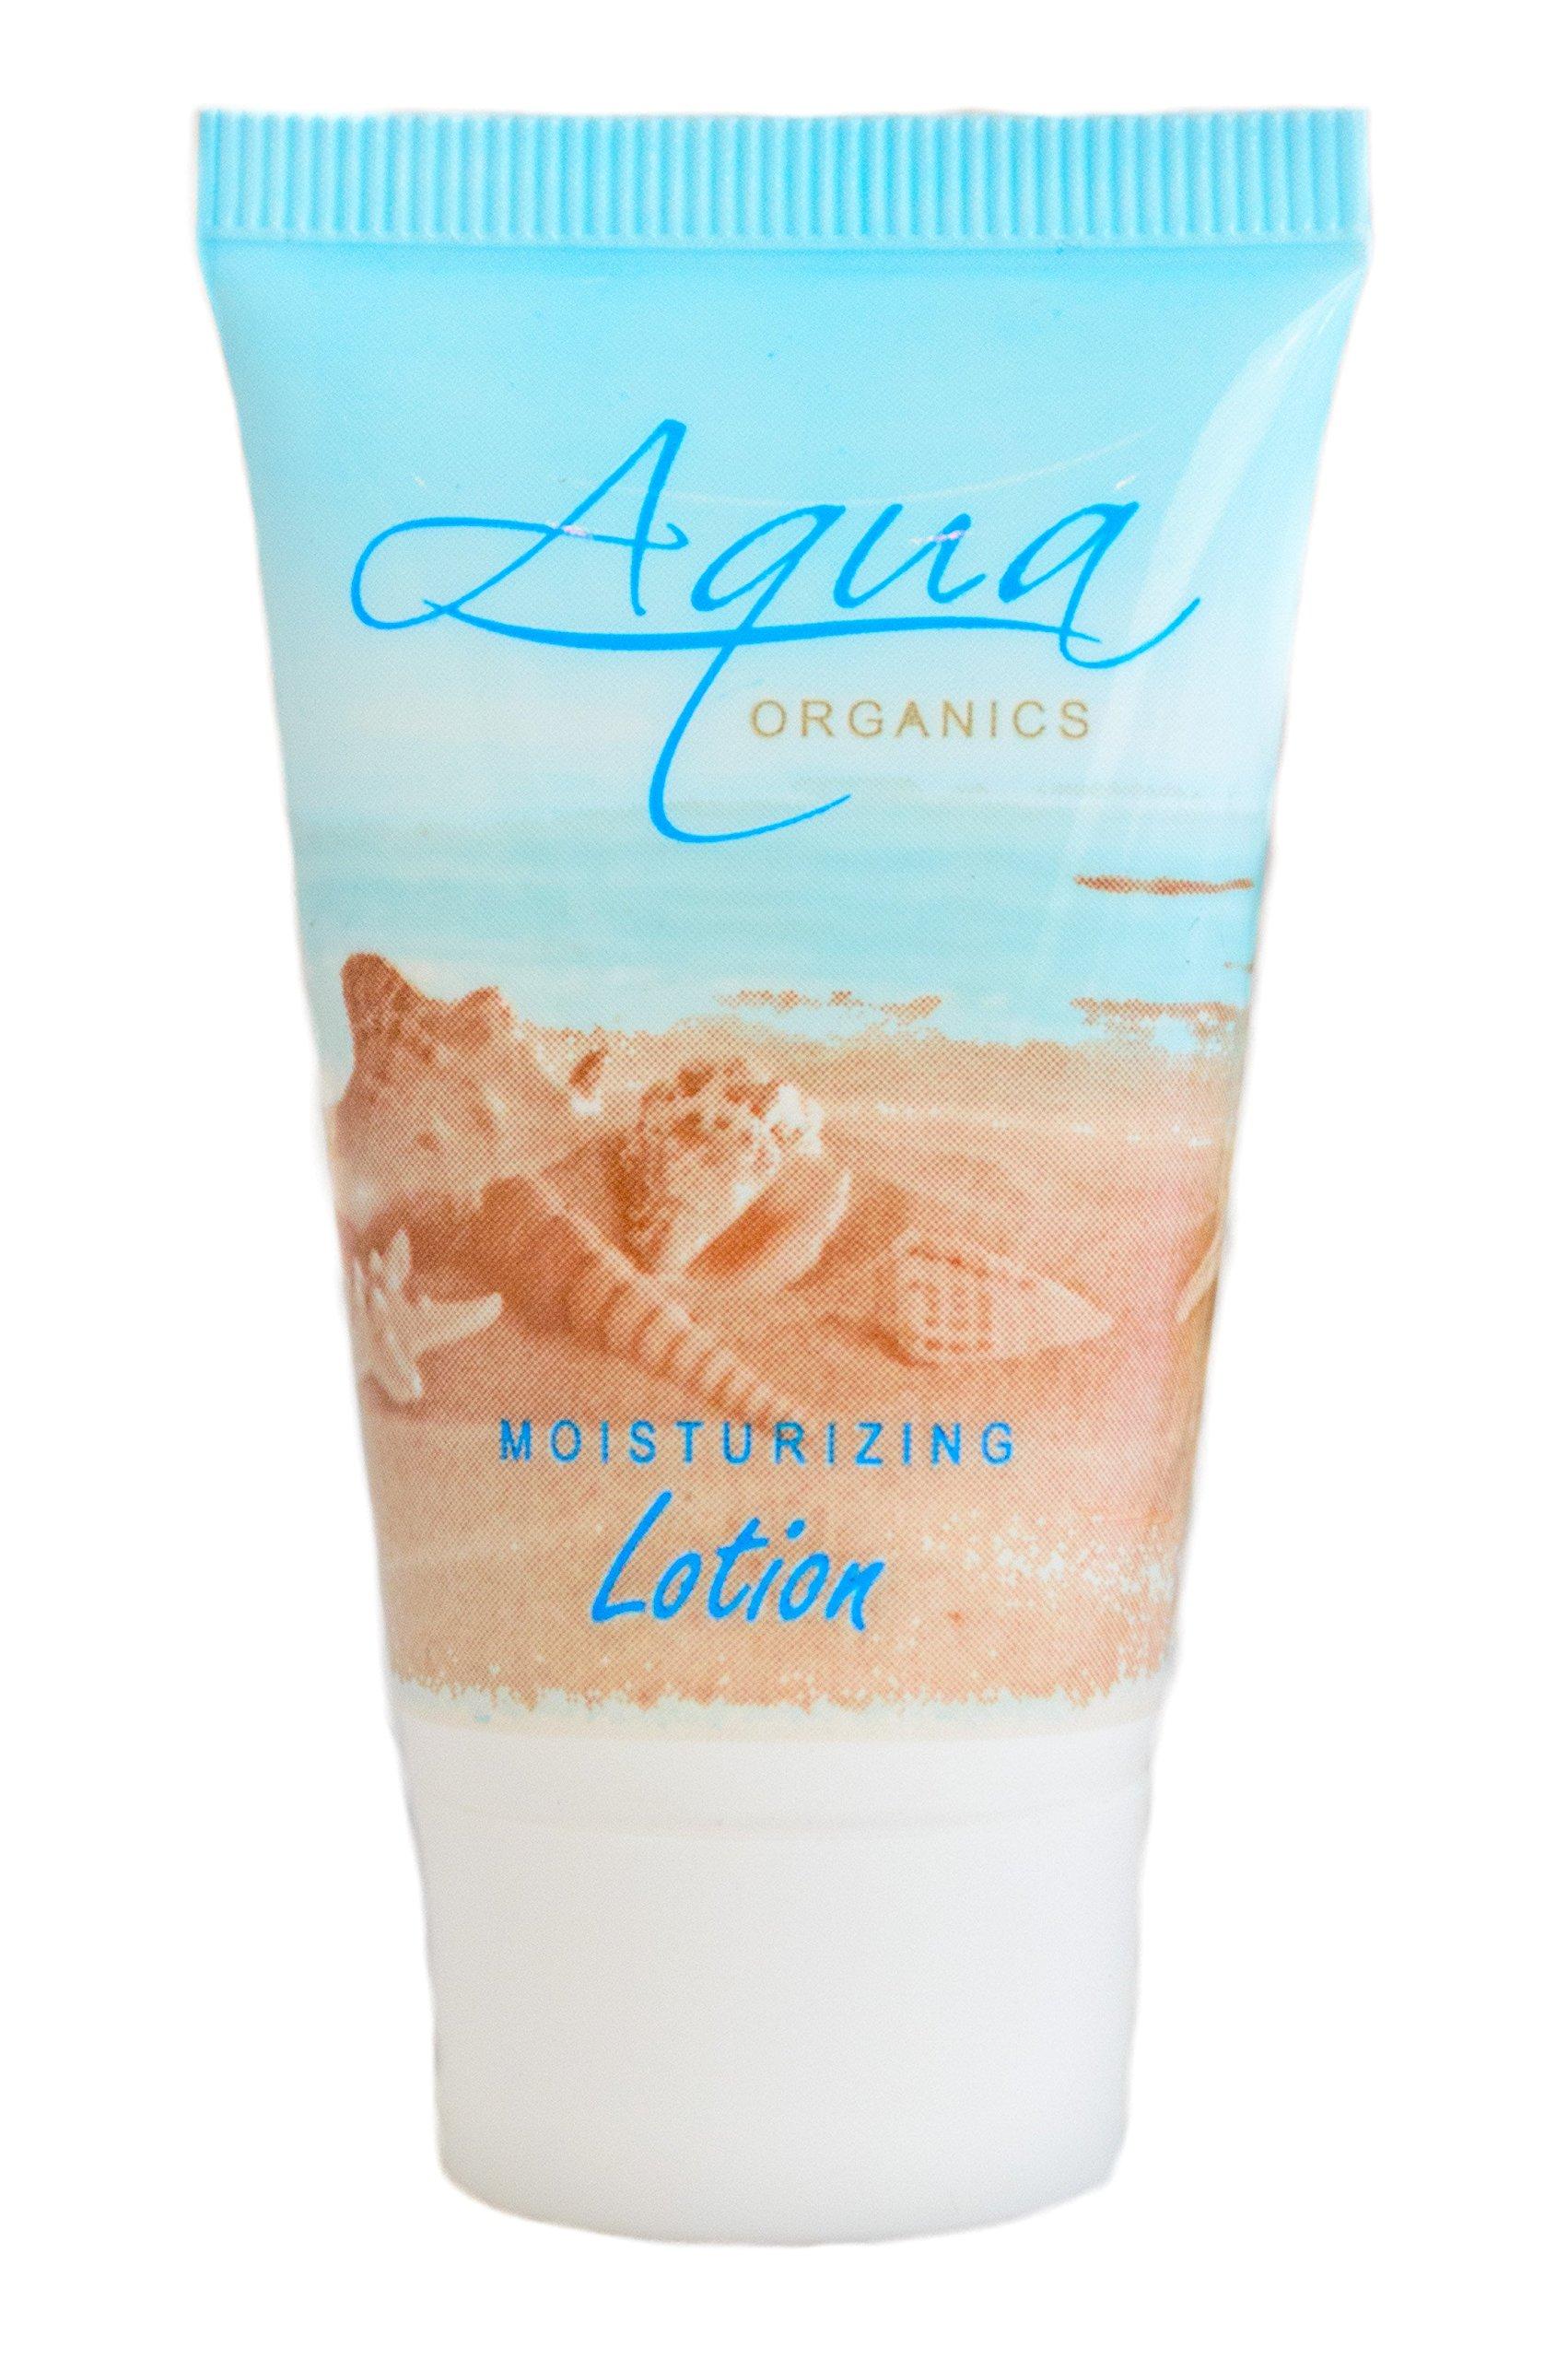 Aqua Organics Lotion, 1 oz. Hospitality/Travel Size Tube with Pure Aloe and Organic Olive Oil (Case of 300)